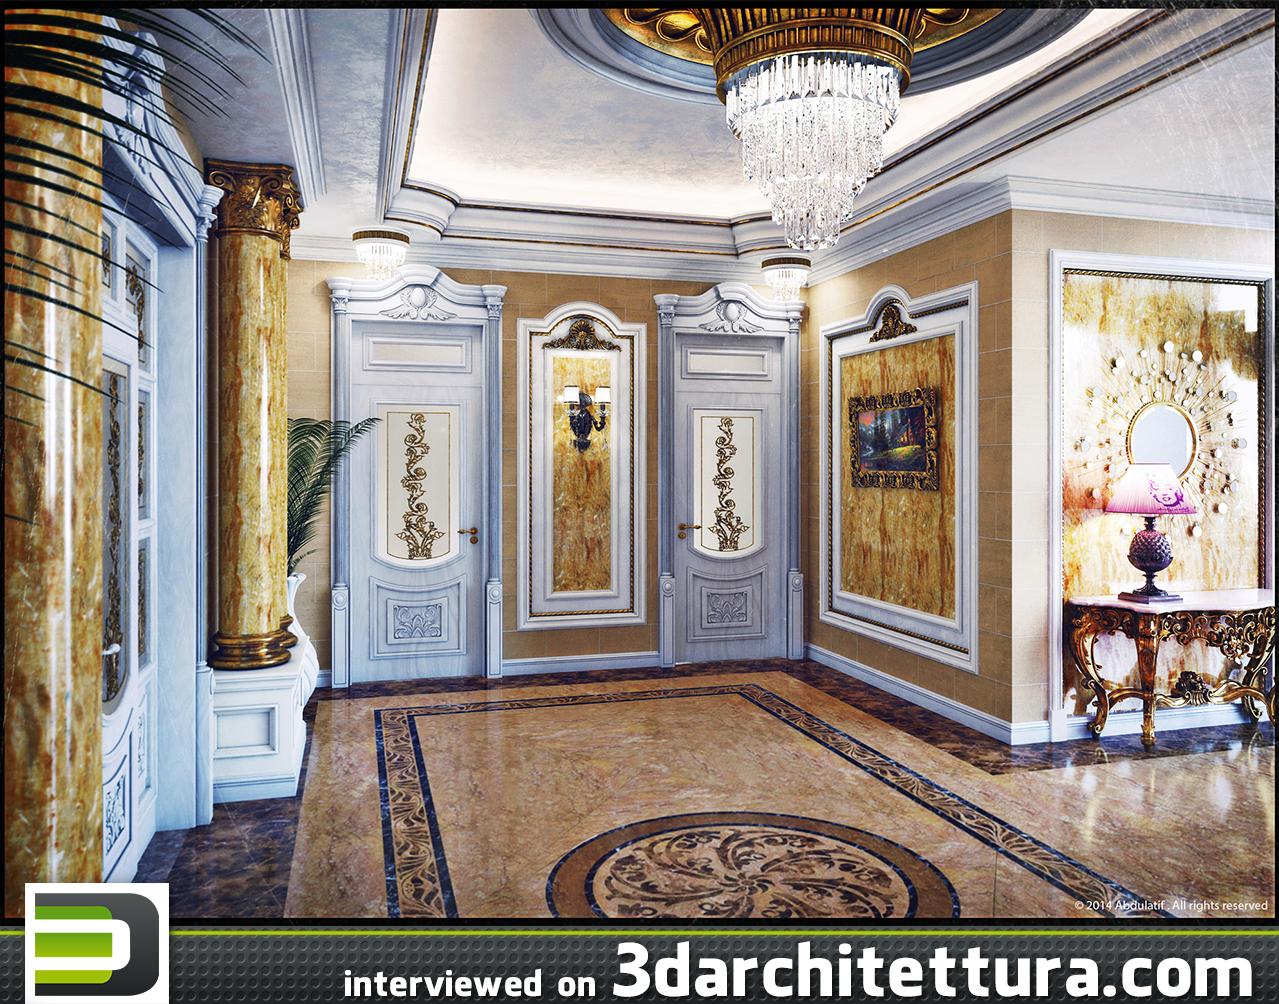 Abdulaif Abidov interviewed for 3D Architettura: render, 3d, CG, architecture, design